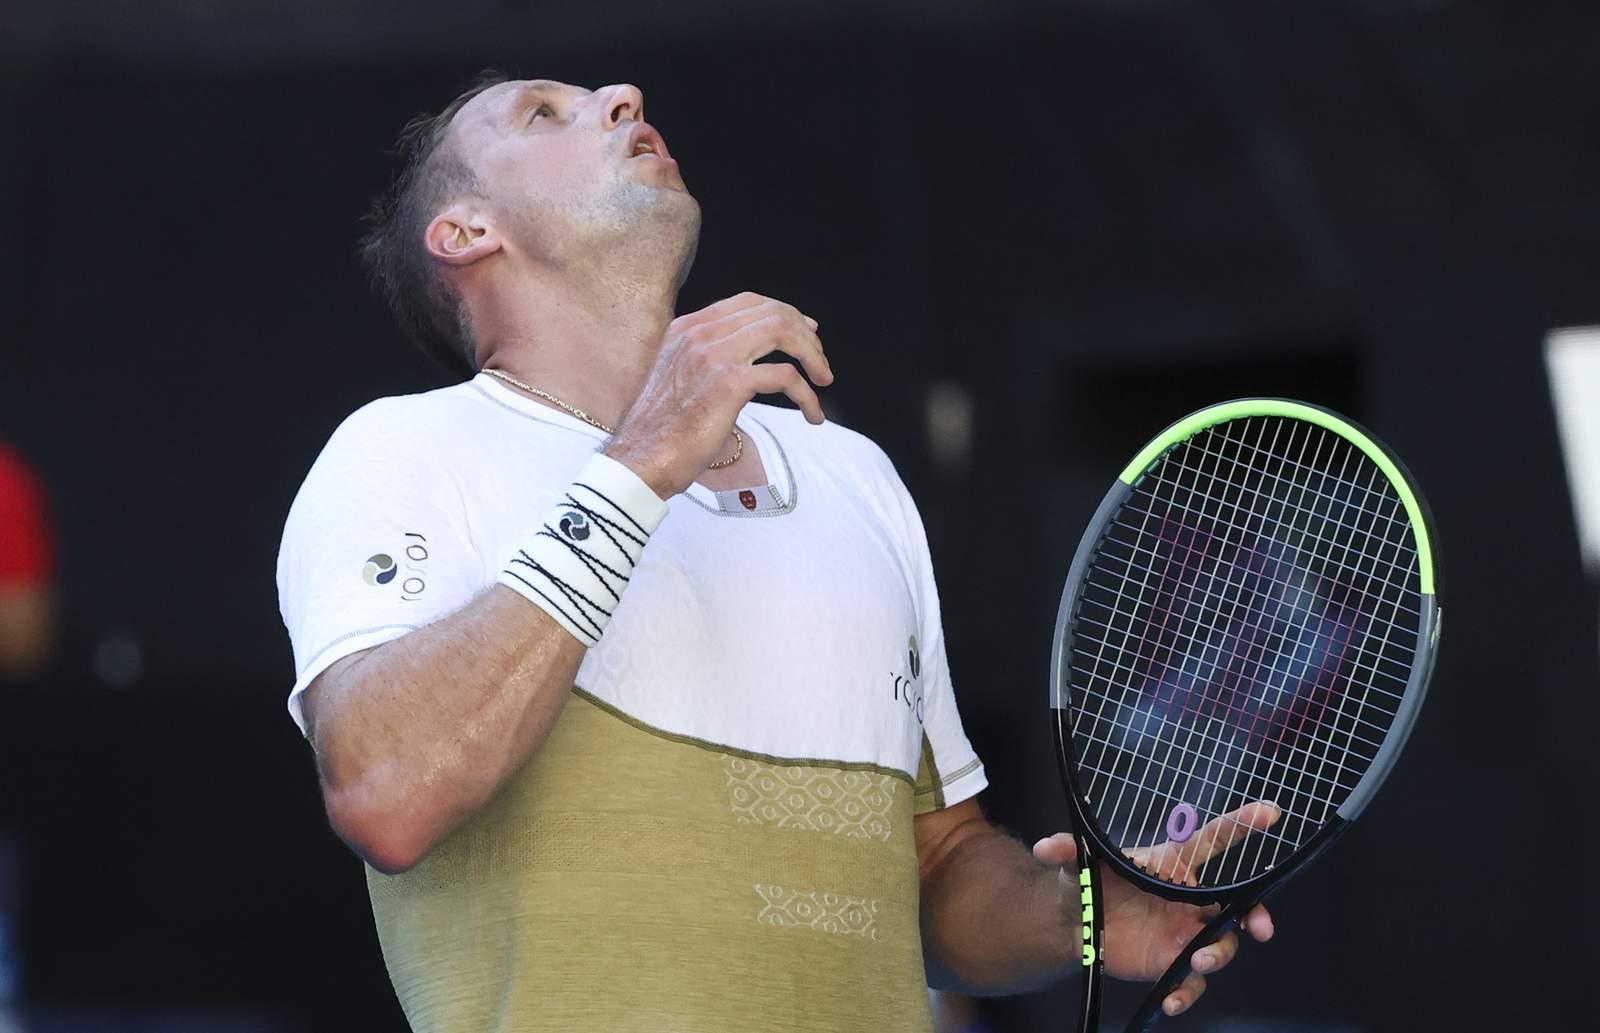 Australian Open's hard quarantine 'took a toll' on players